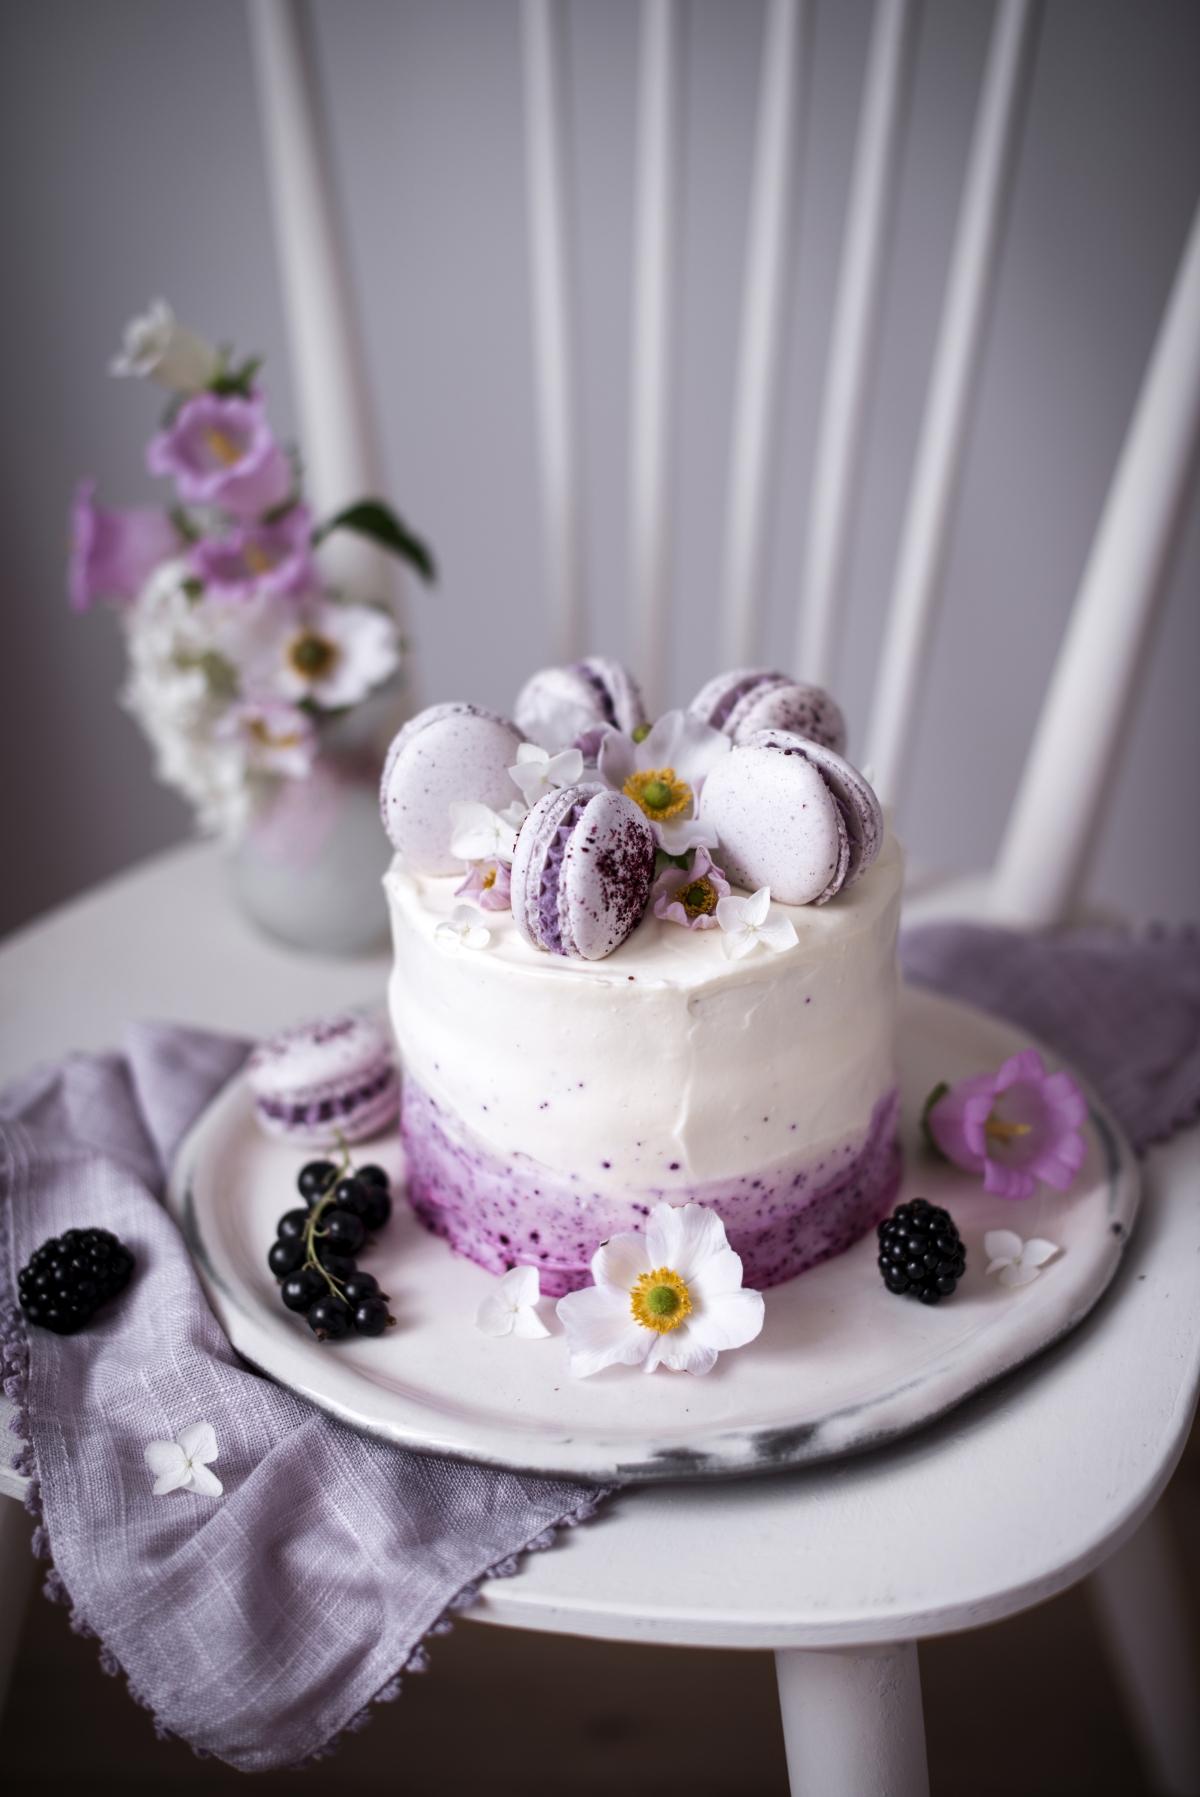 01-Frau-Herzblut_Cassis-Joghurt-Toertchen-mit-Macarons